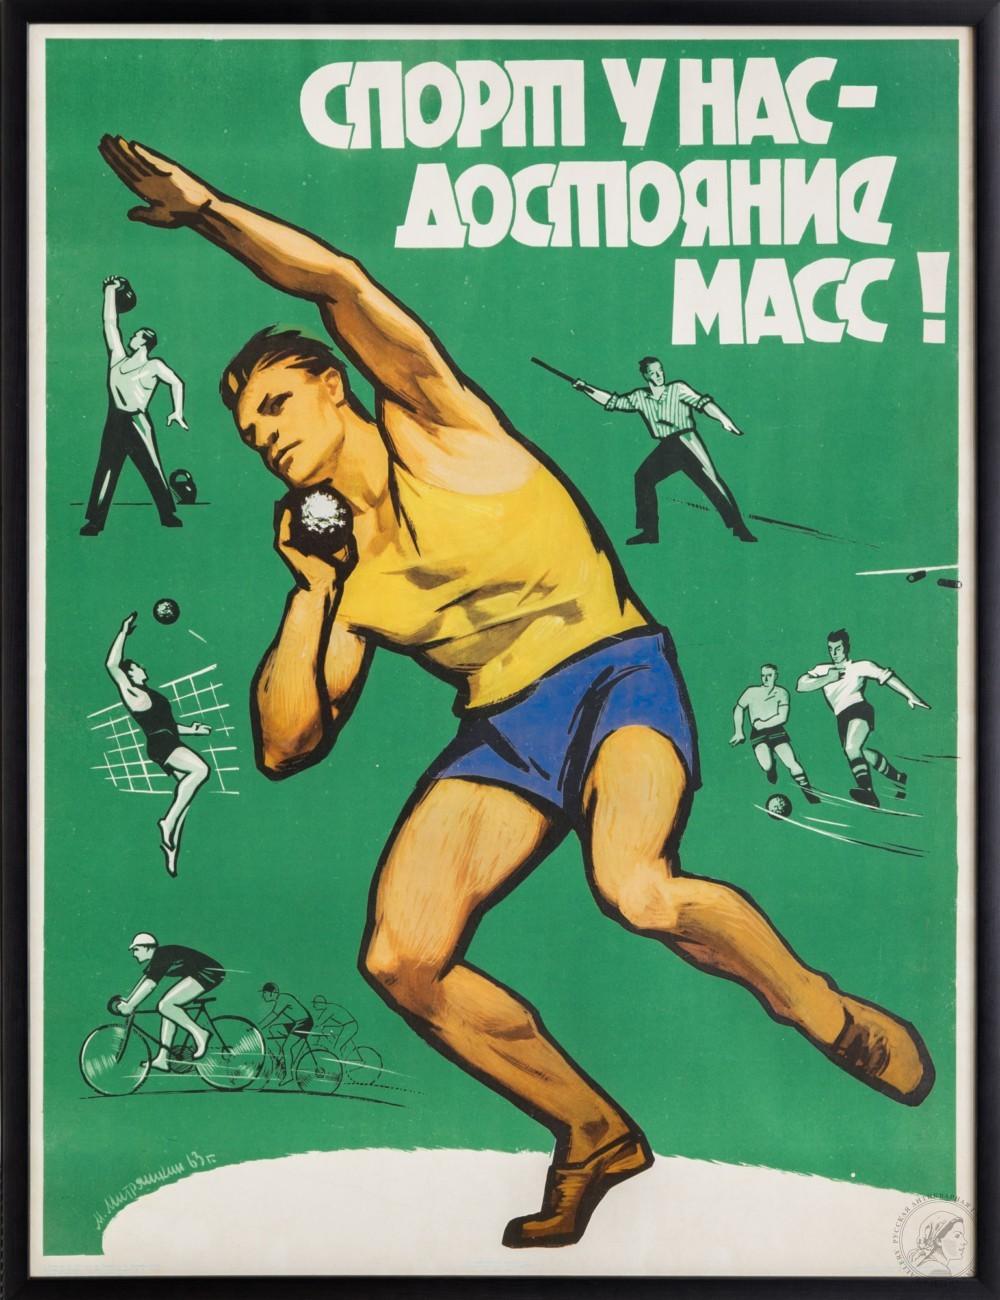 Плакат «Спорт у нас — достояние масс!»